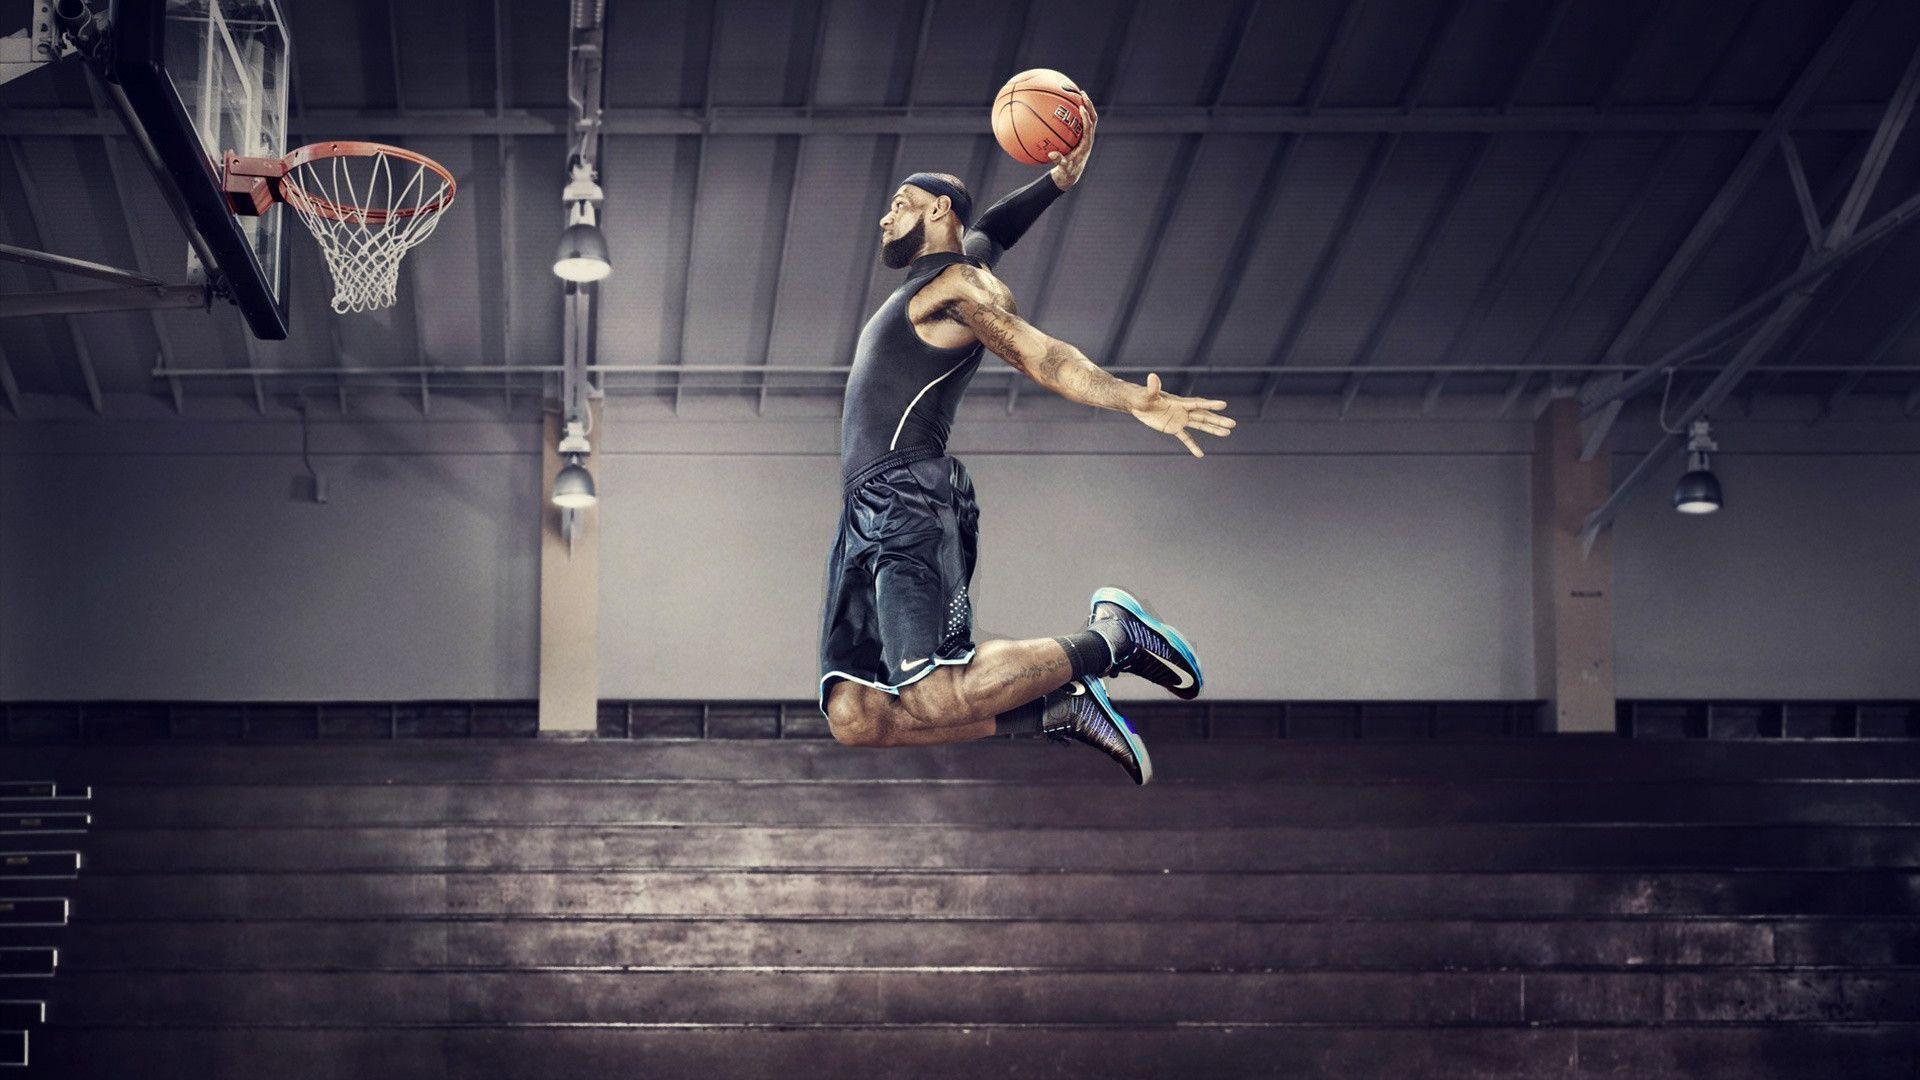 Lebron James Wallpapers Nike 1920x1080